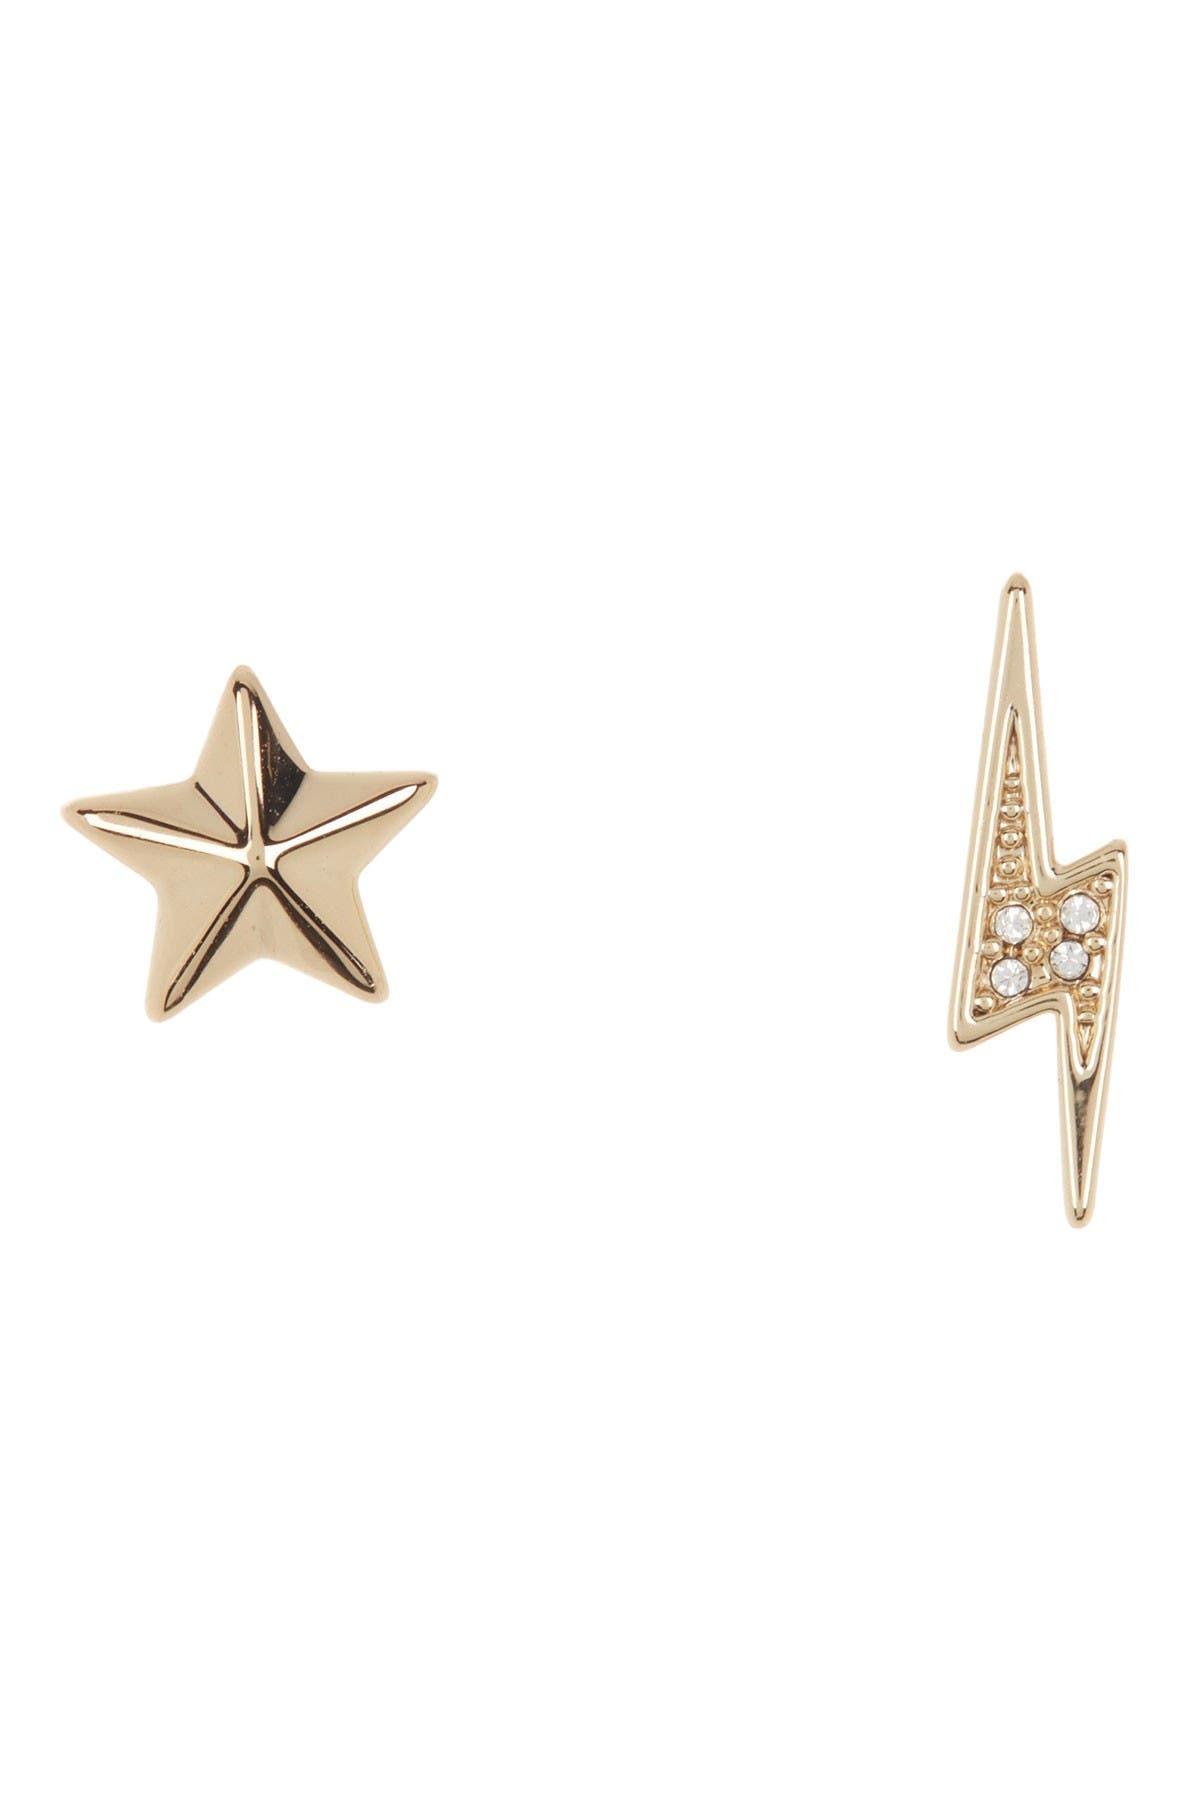 Image of Rebecca Minkoff Mismatched Star & Lightning Bolt Stud Earrings